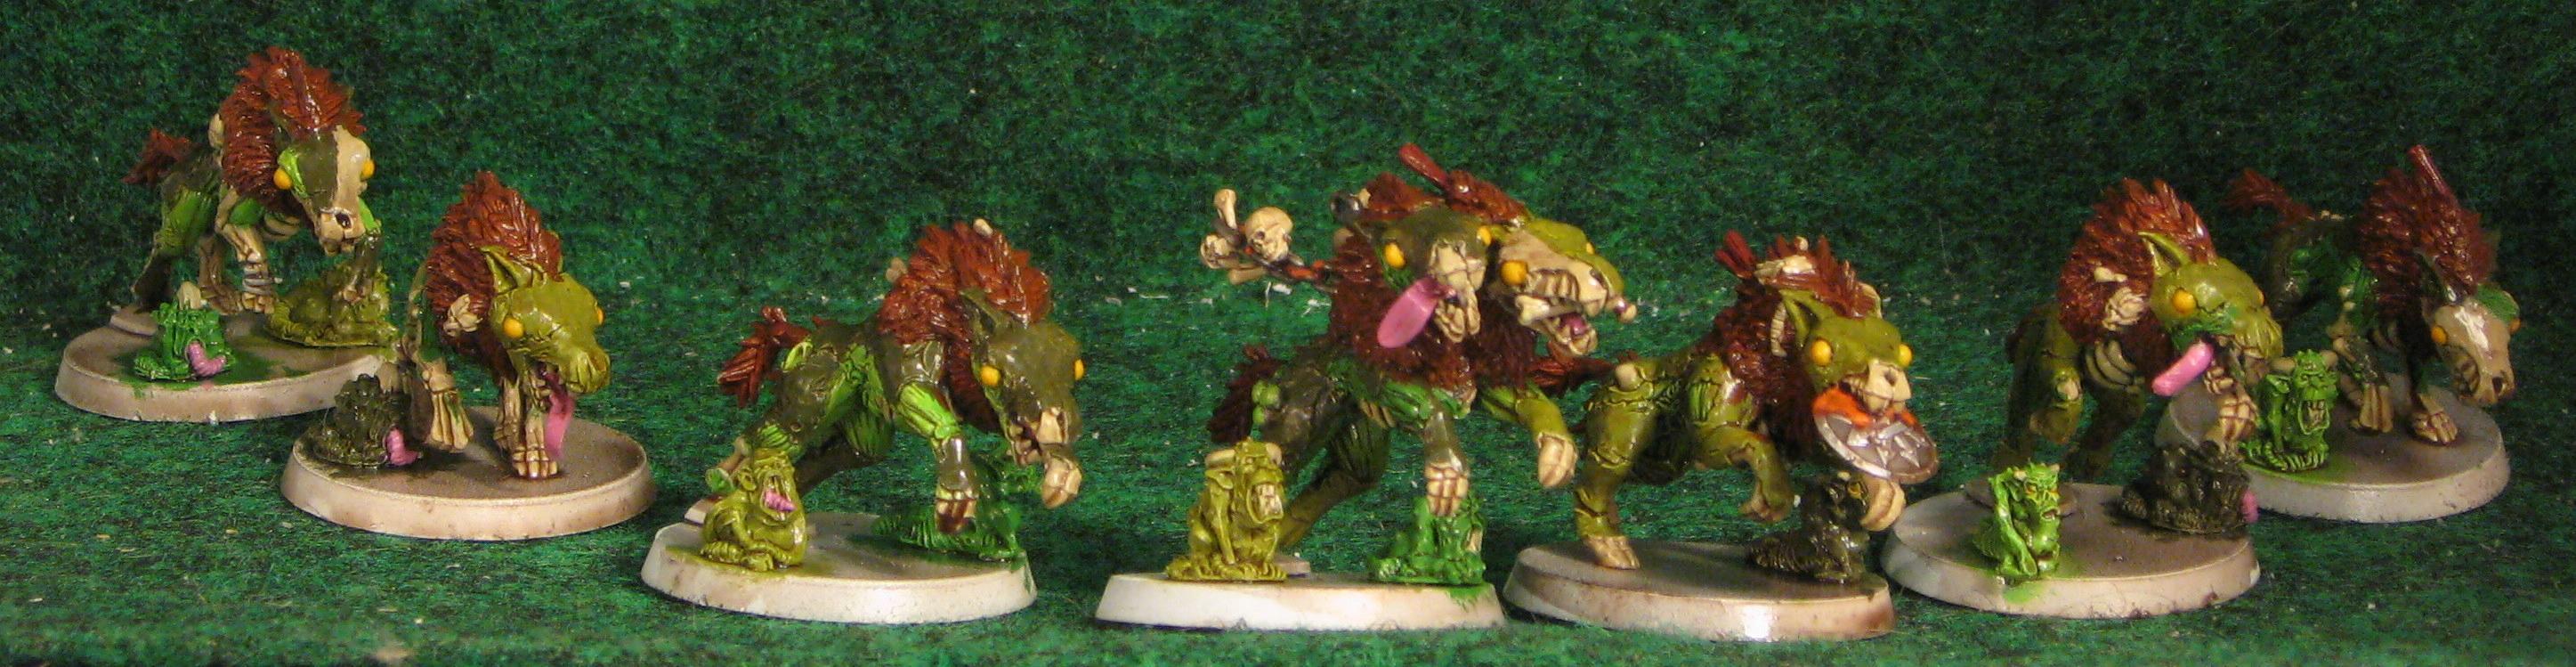 Beasts Of Nurgle, Daemons, Humorous, Nurgle